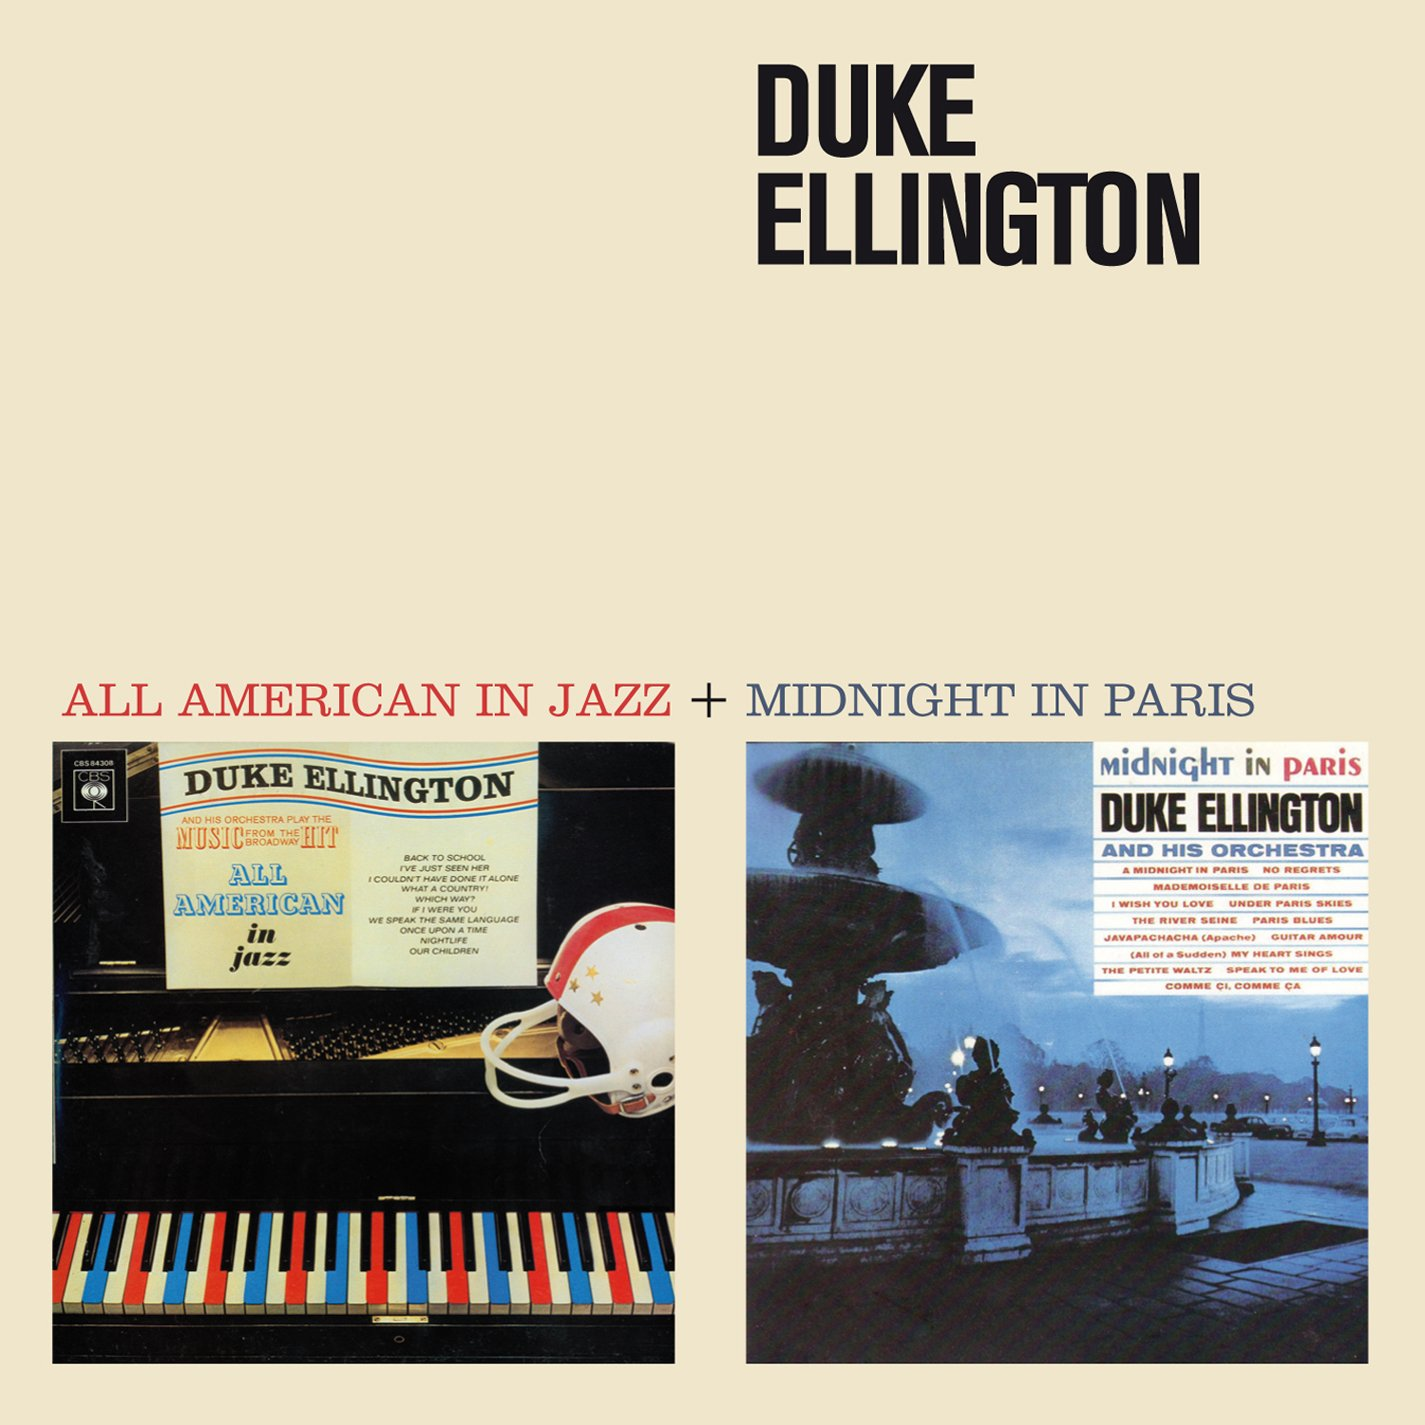 All American in Jazz + Midnight in Paris (Bonus Track Version)